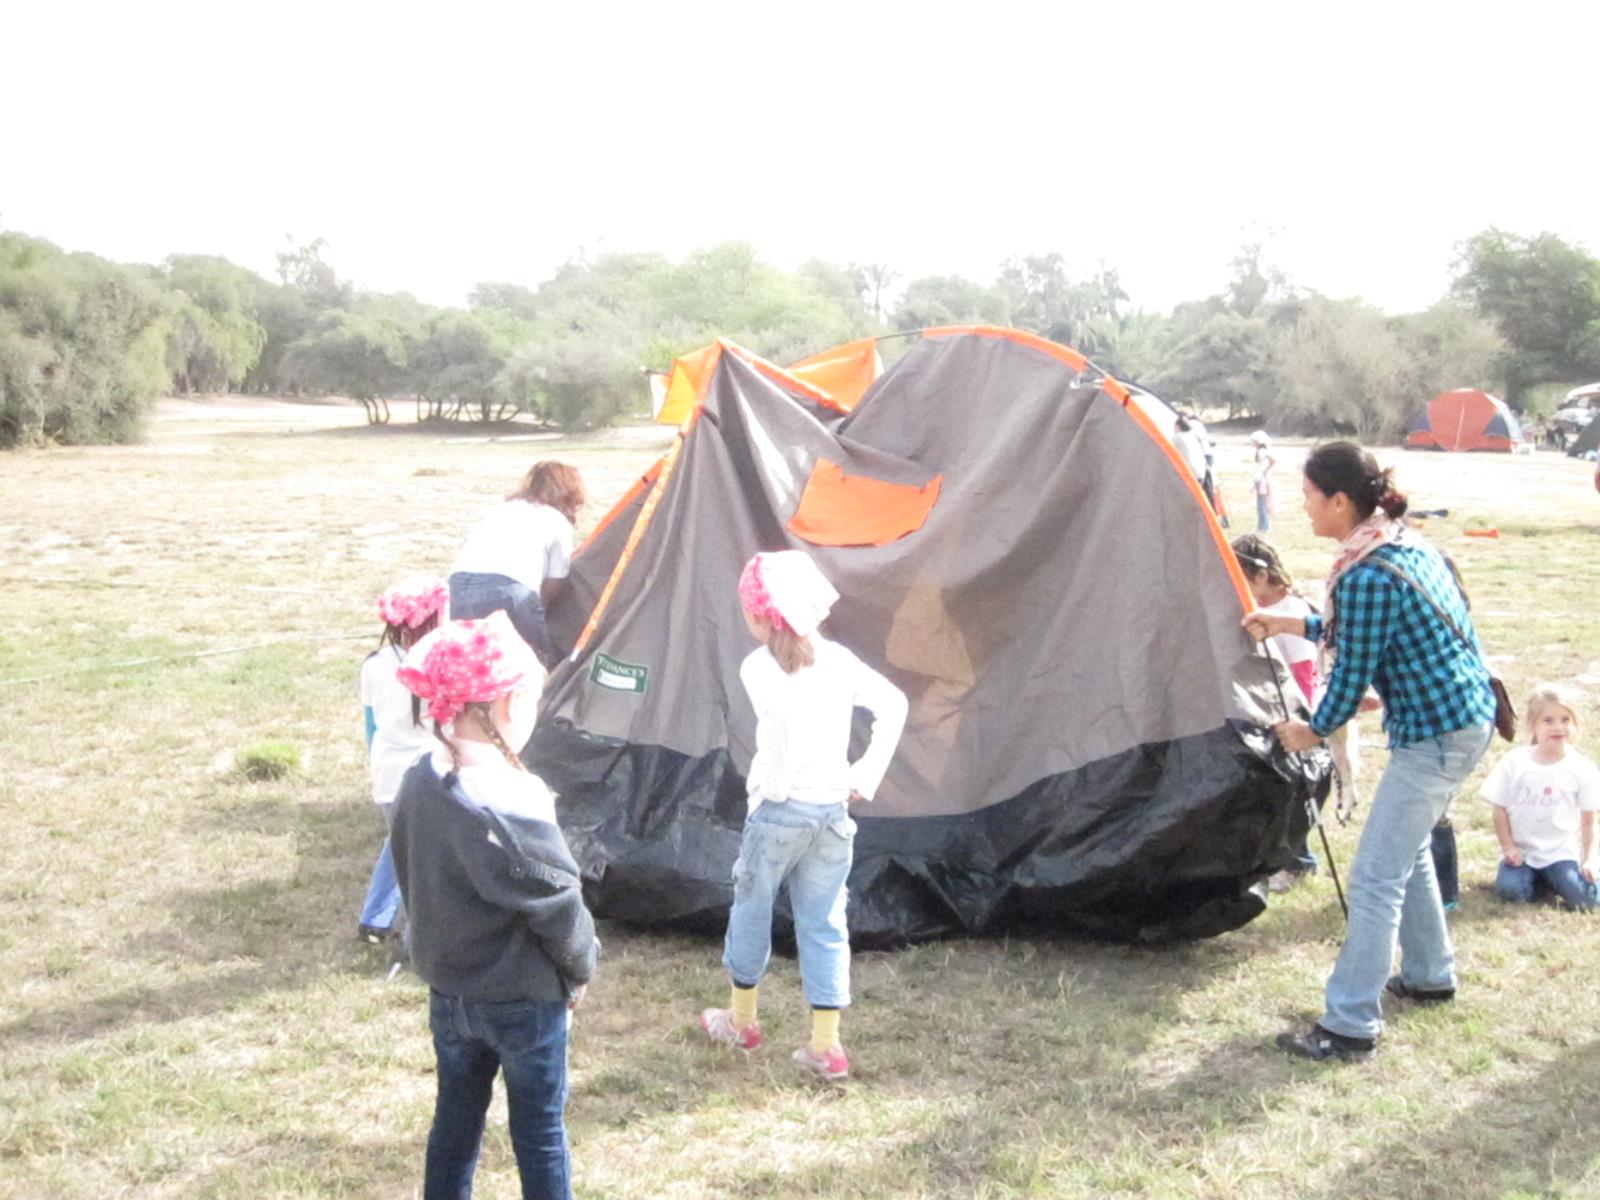 Setting up the tent ... Al Shahaniya 2012